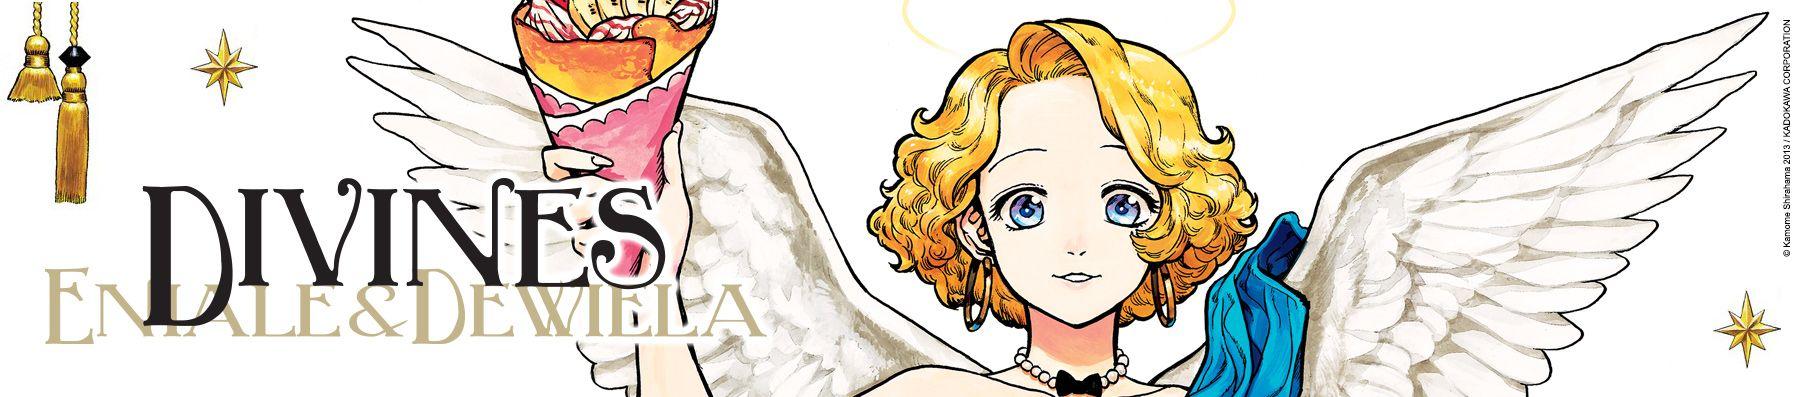 Dossier manga - Divines - Eniale & Dewiela